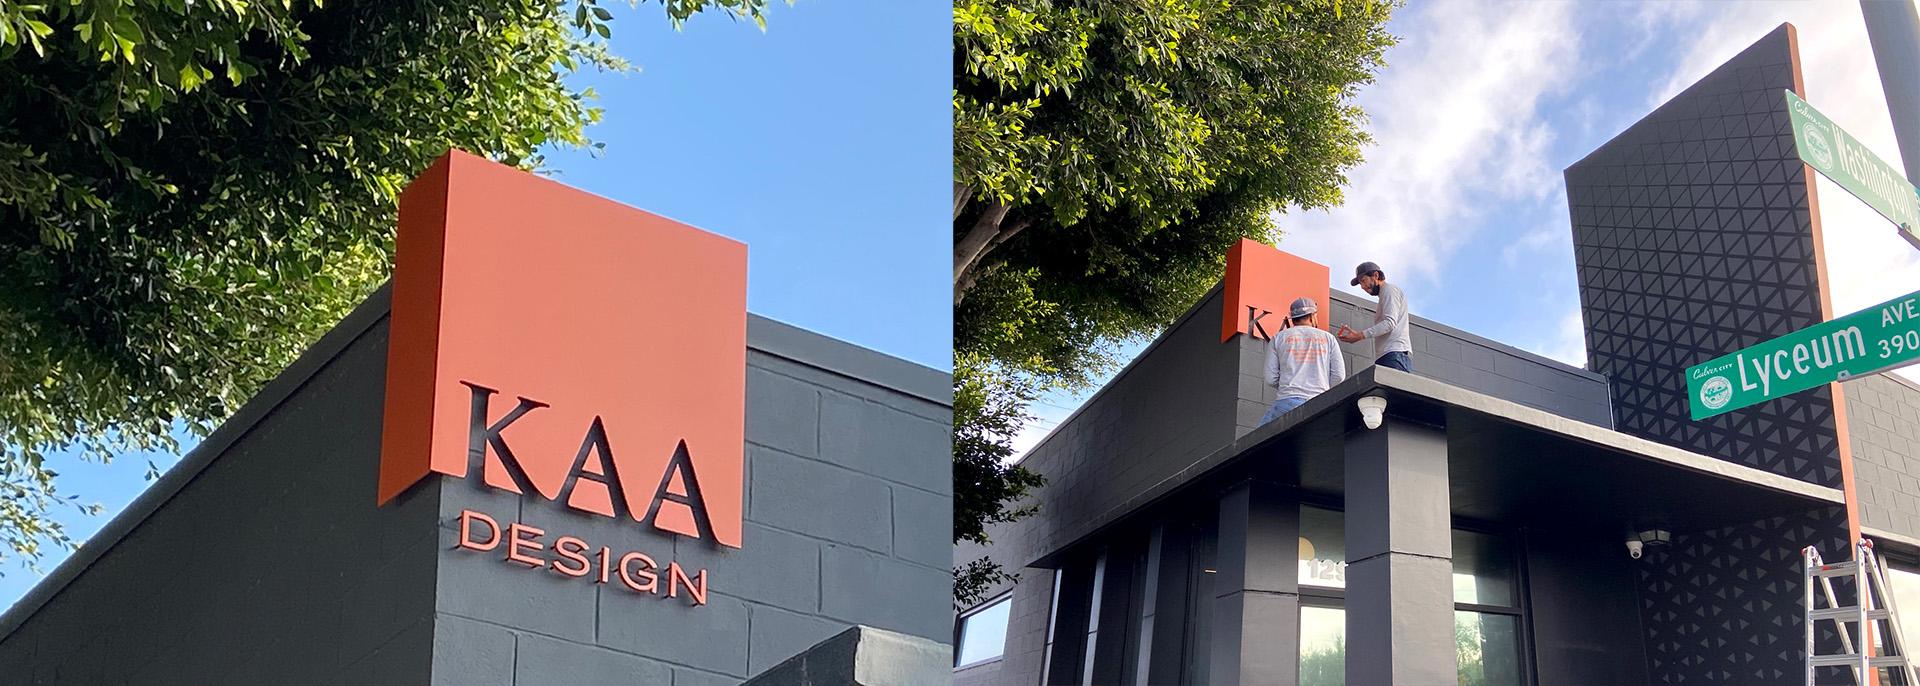 KAA Design Signage